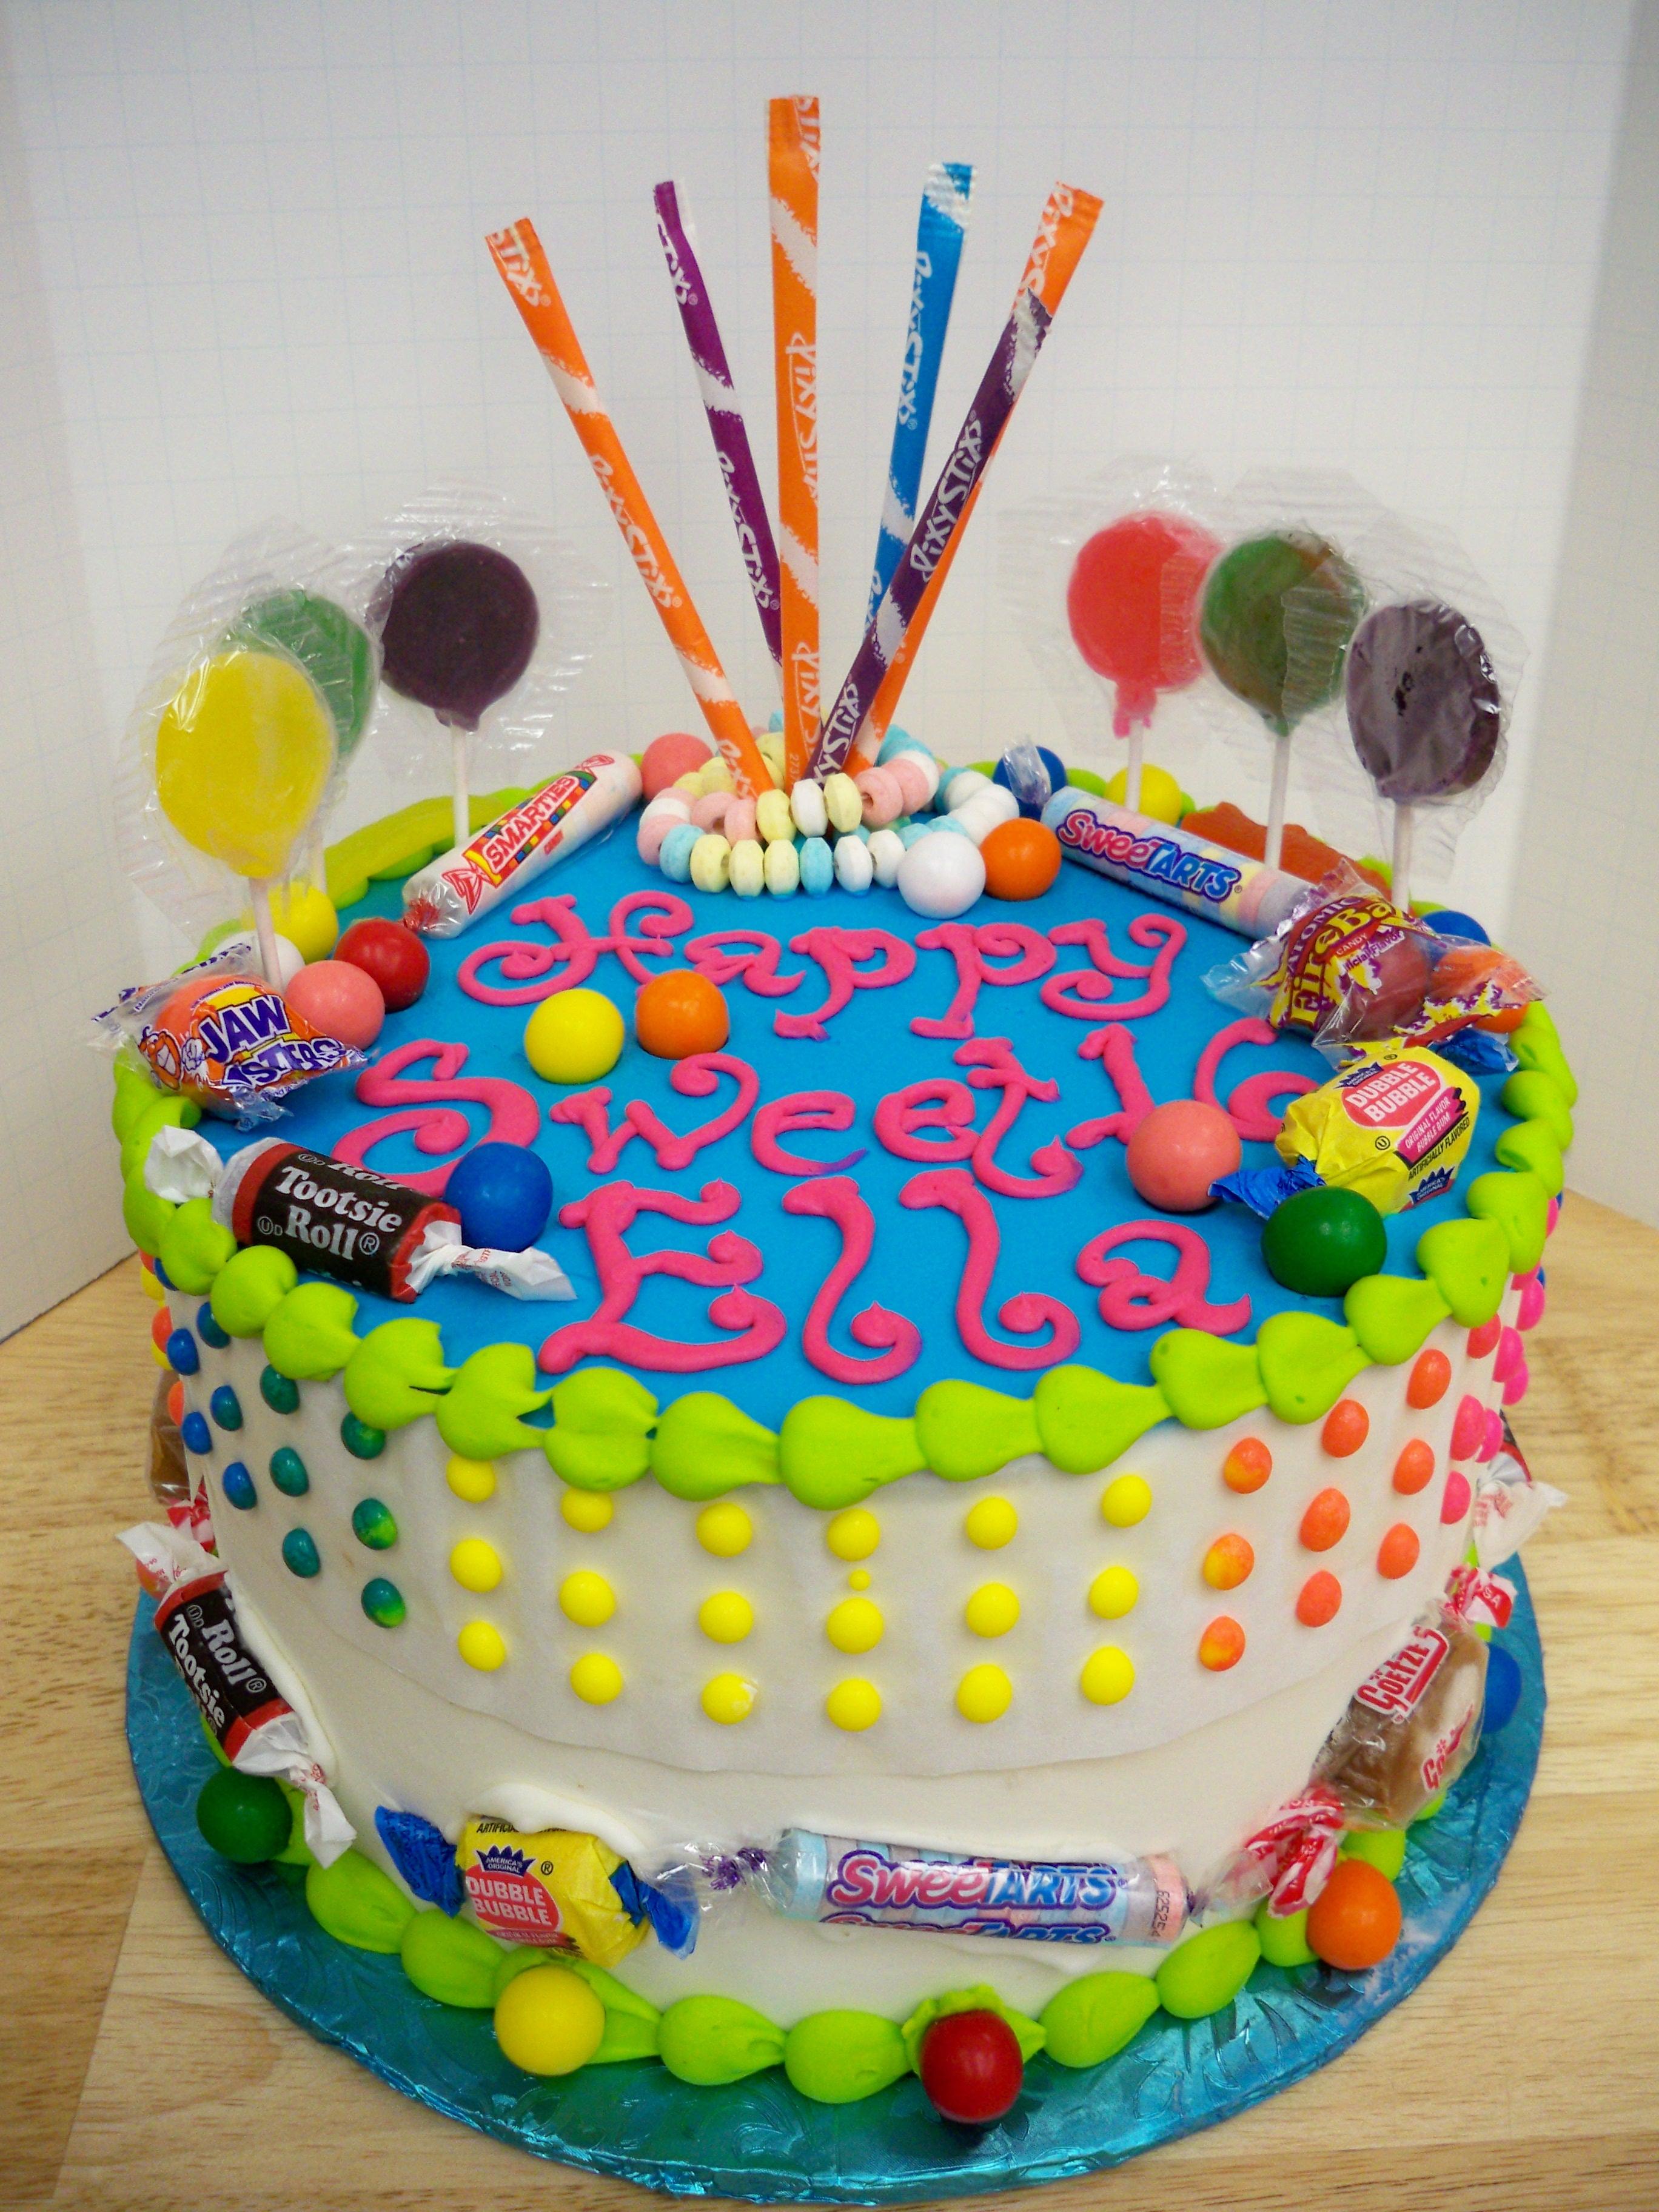 penny candy cake, candy cake, candy birthday cake